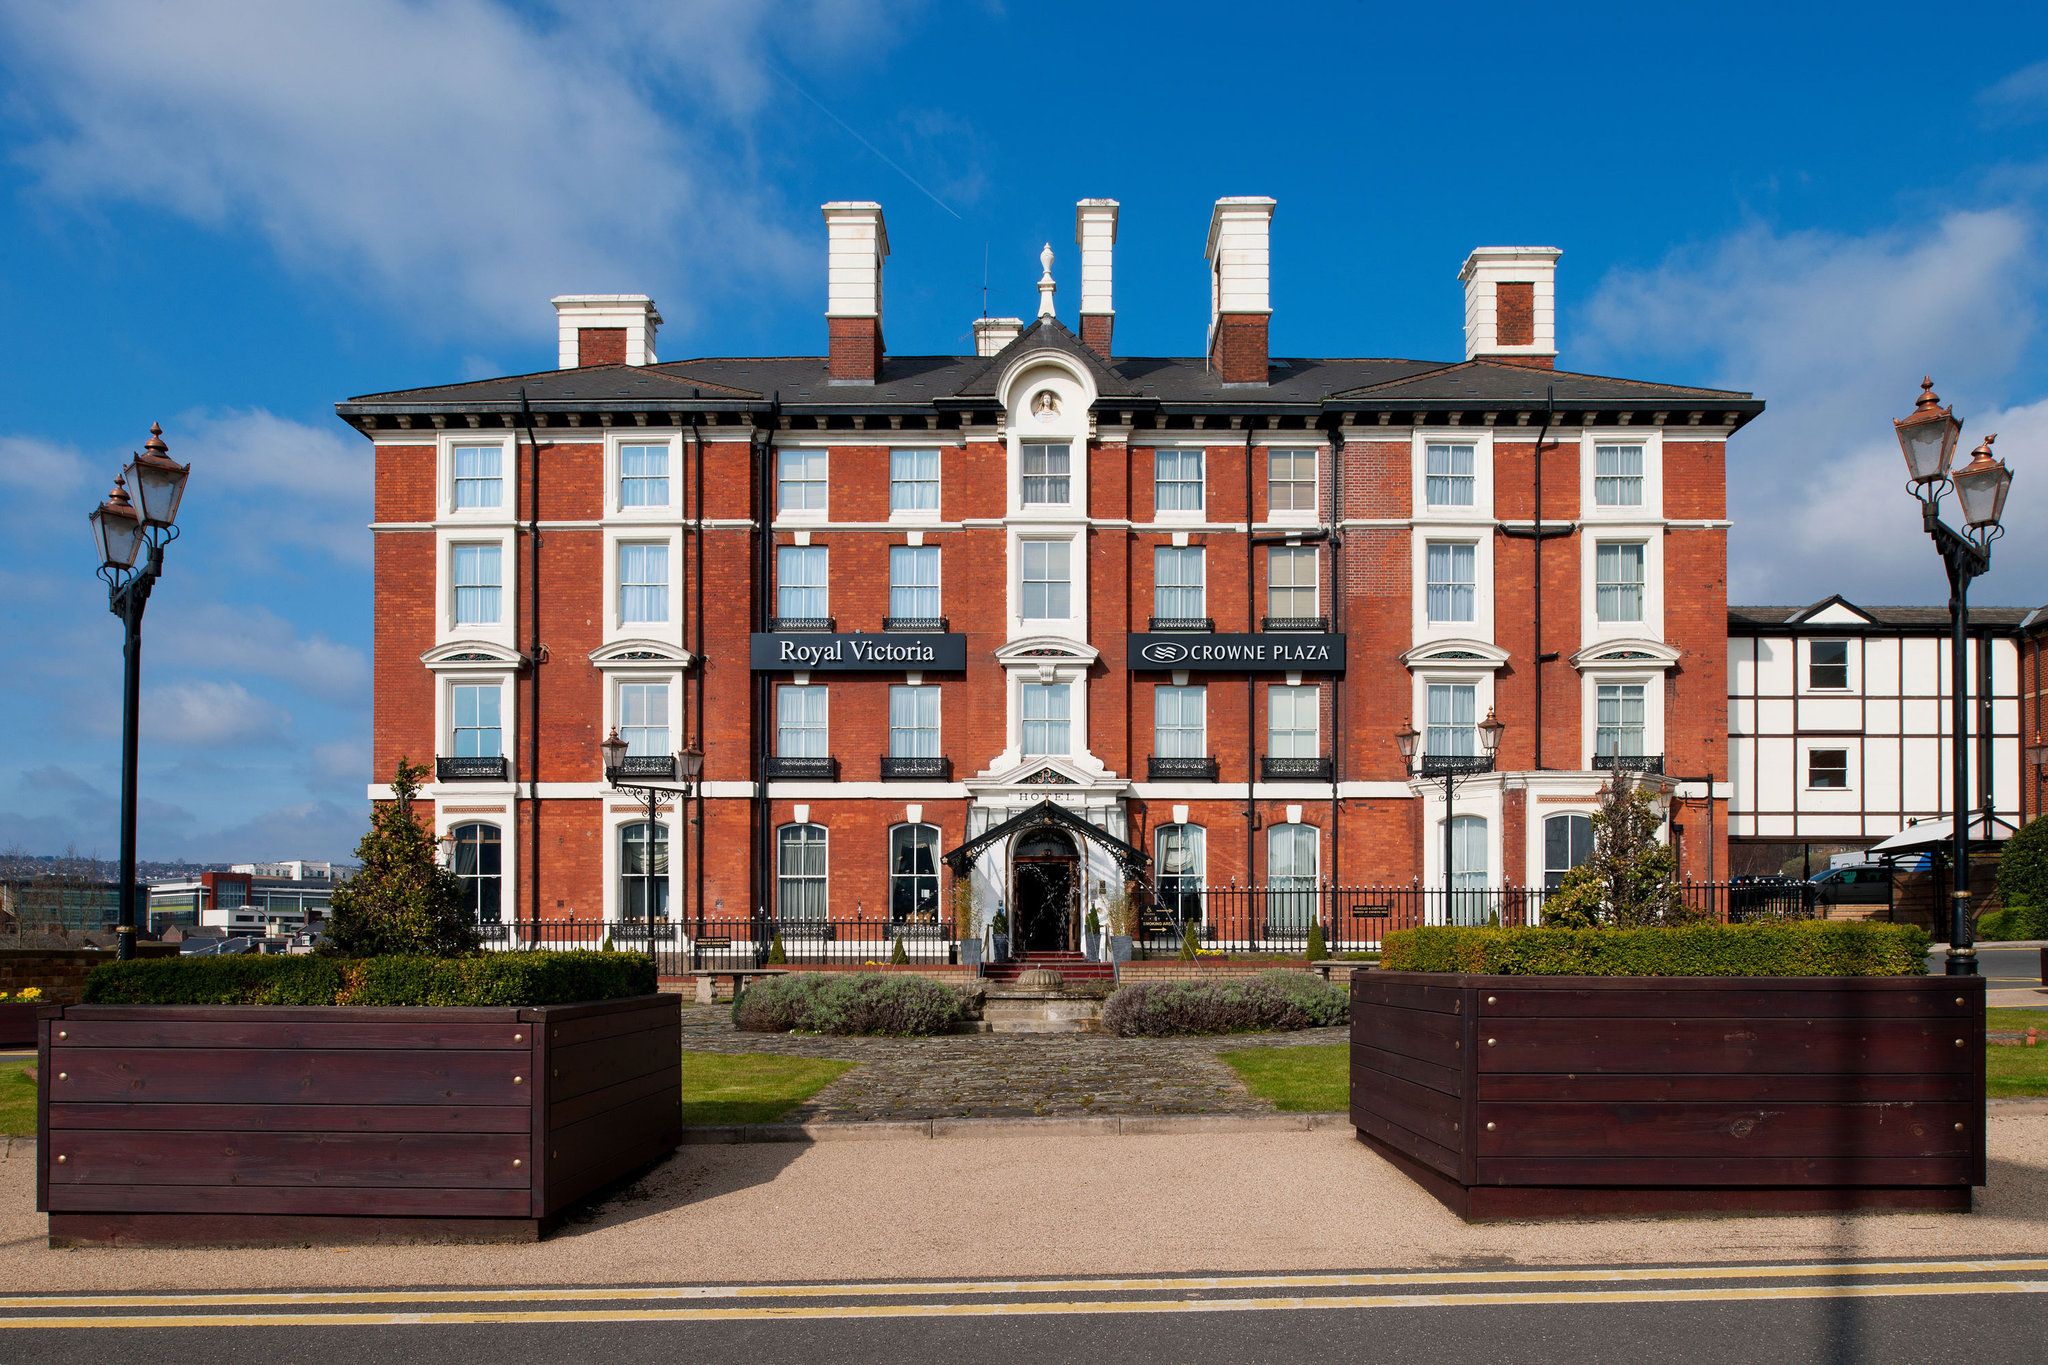 Holiday Inn Royal Victoria